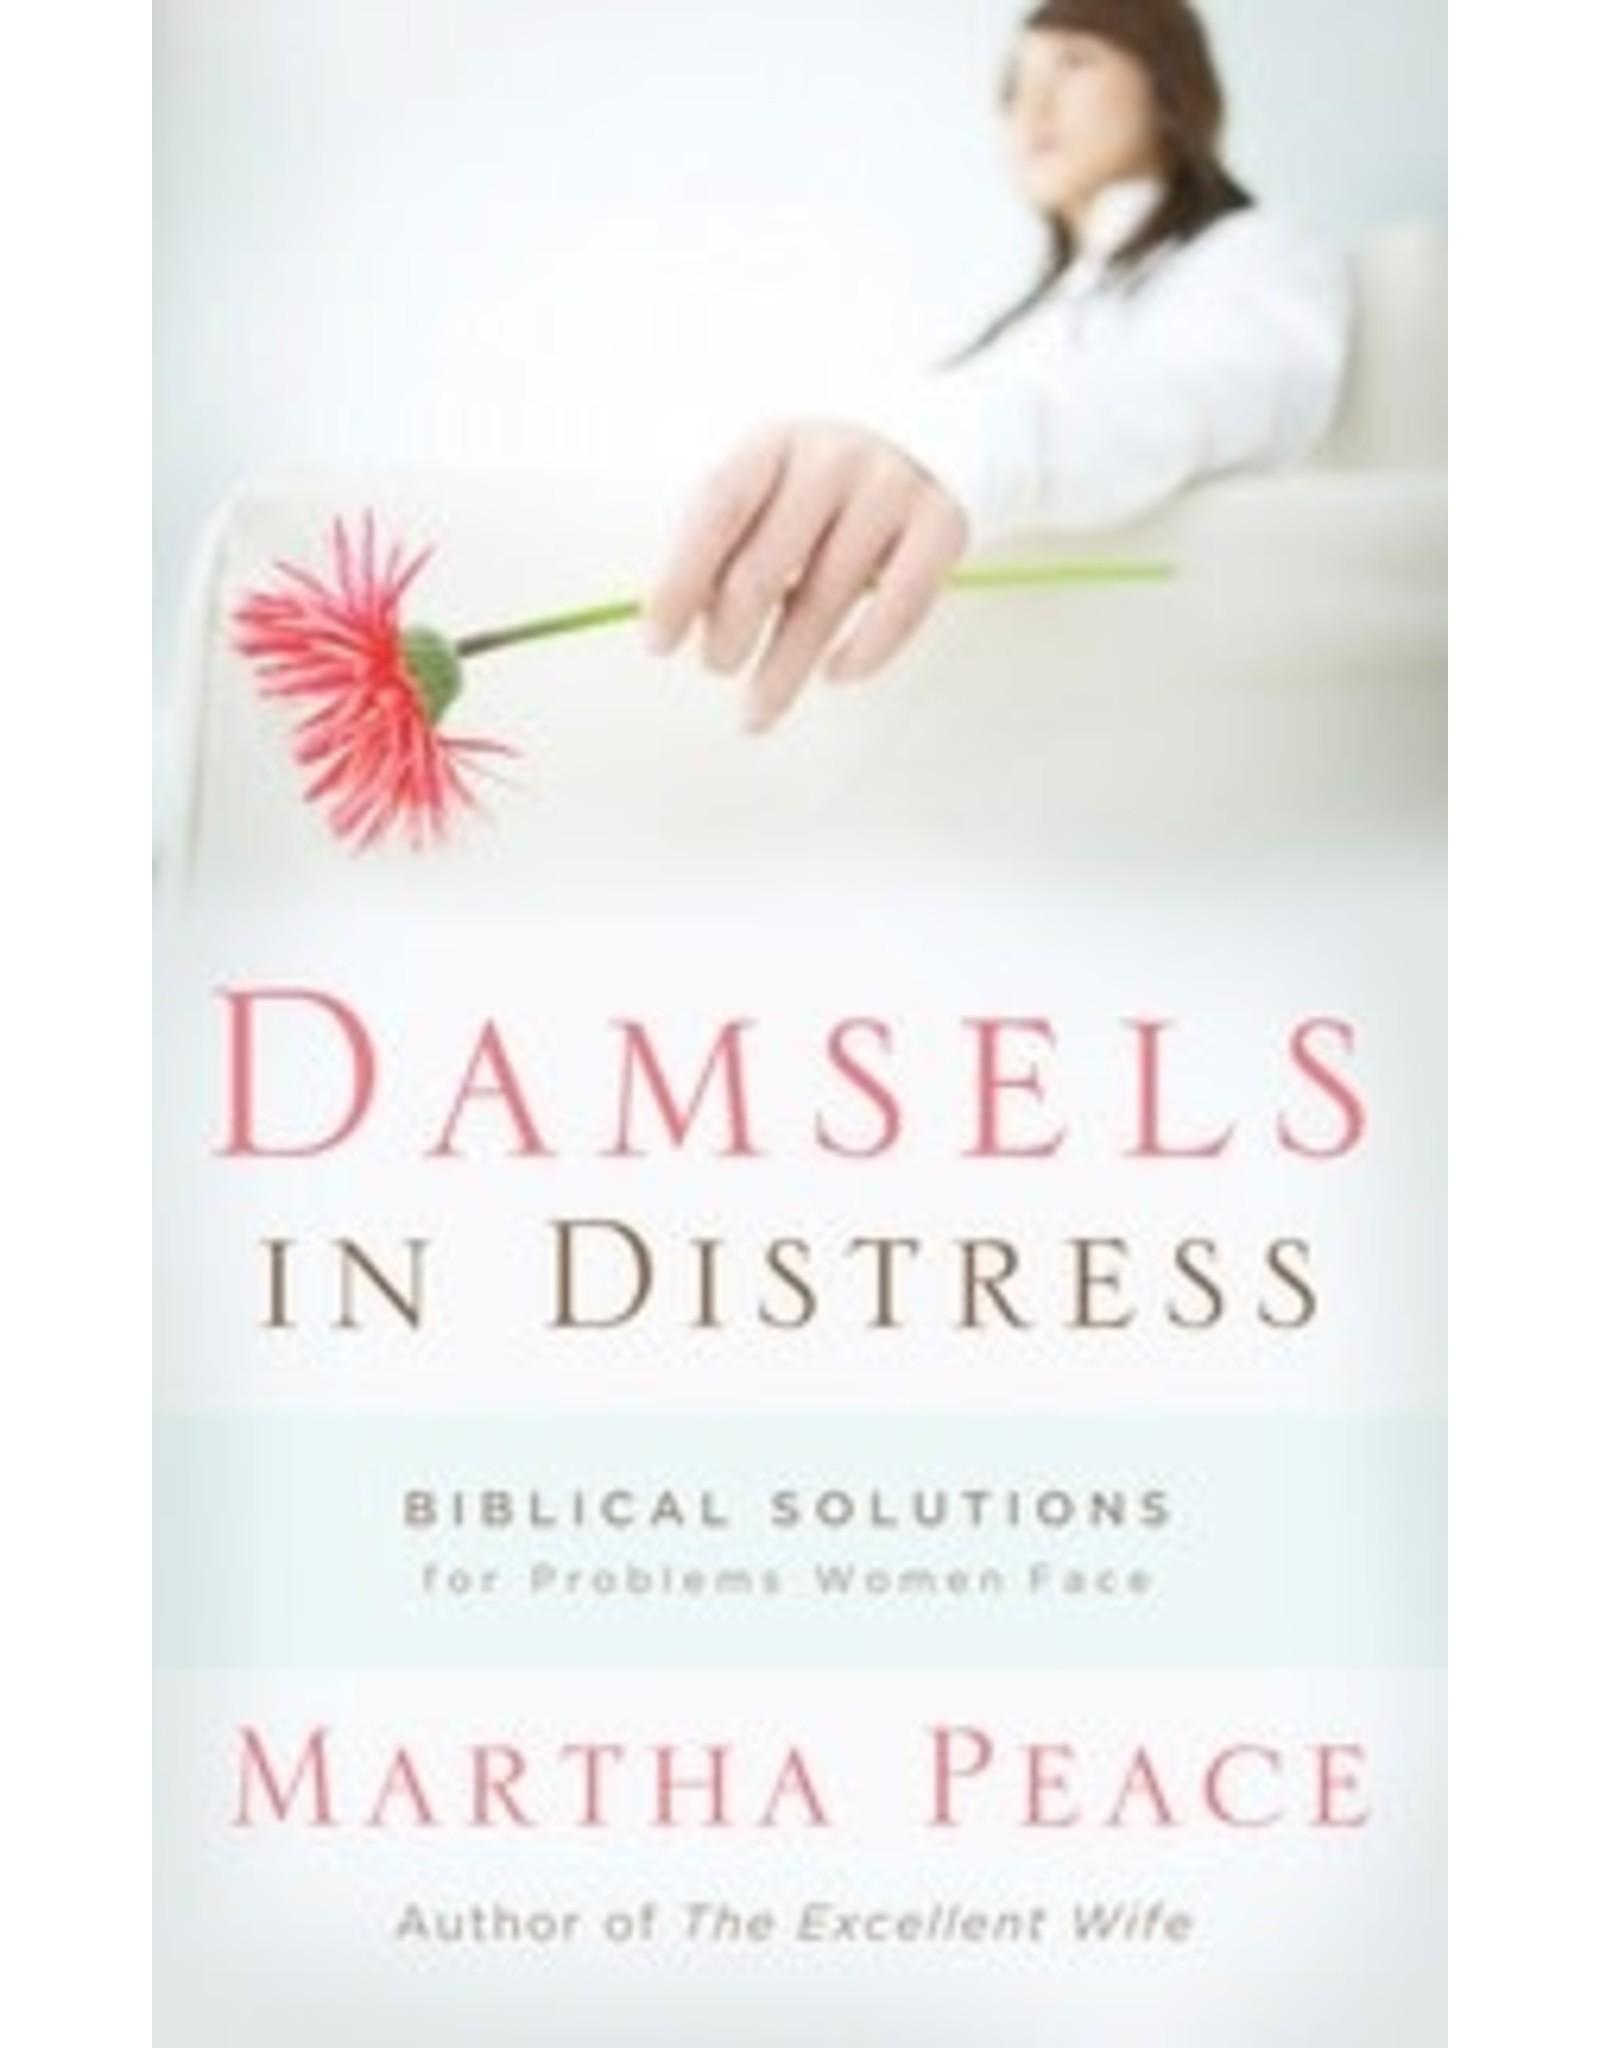 Peace Damsels in Distress